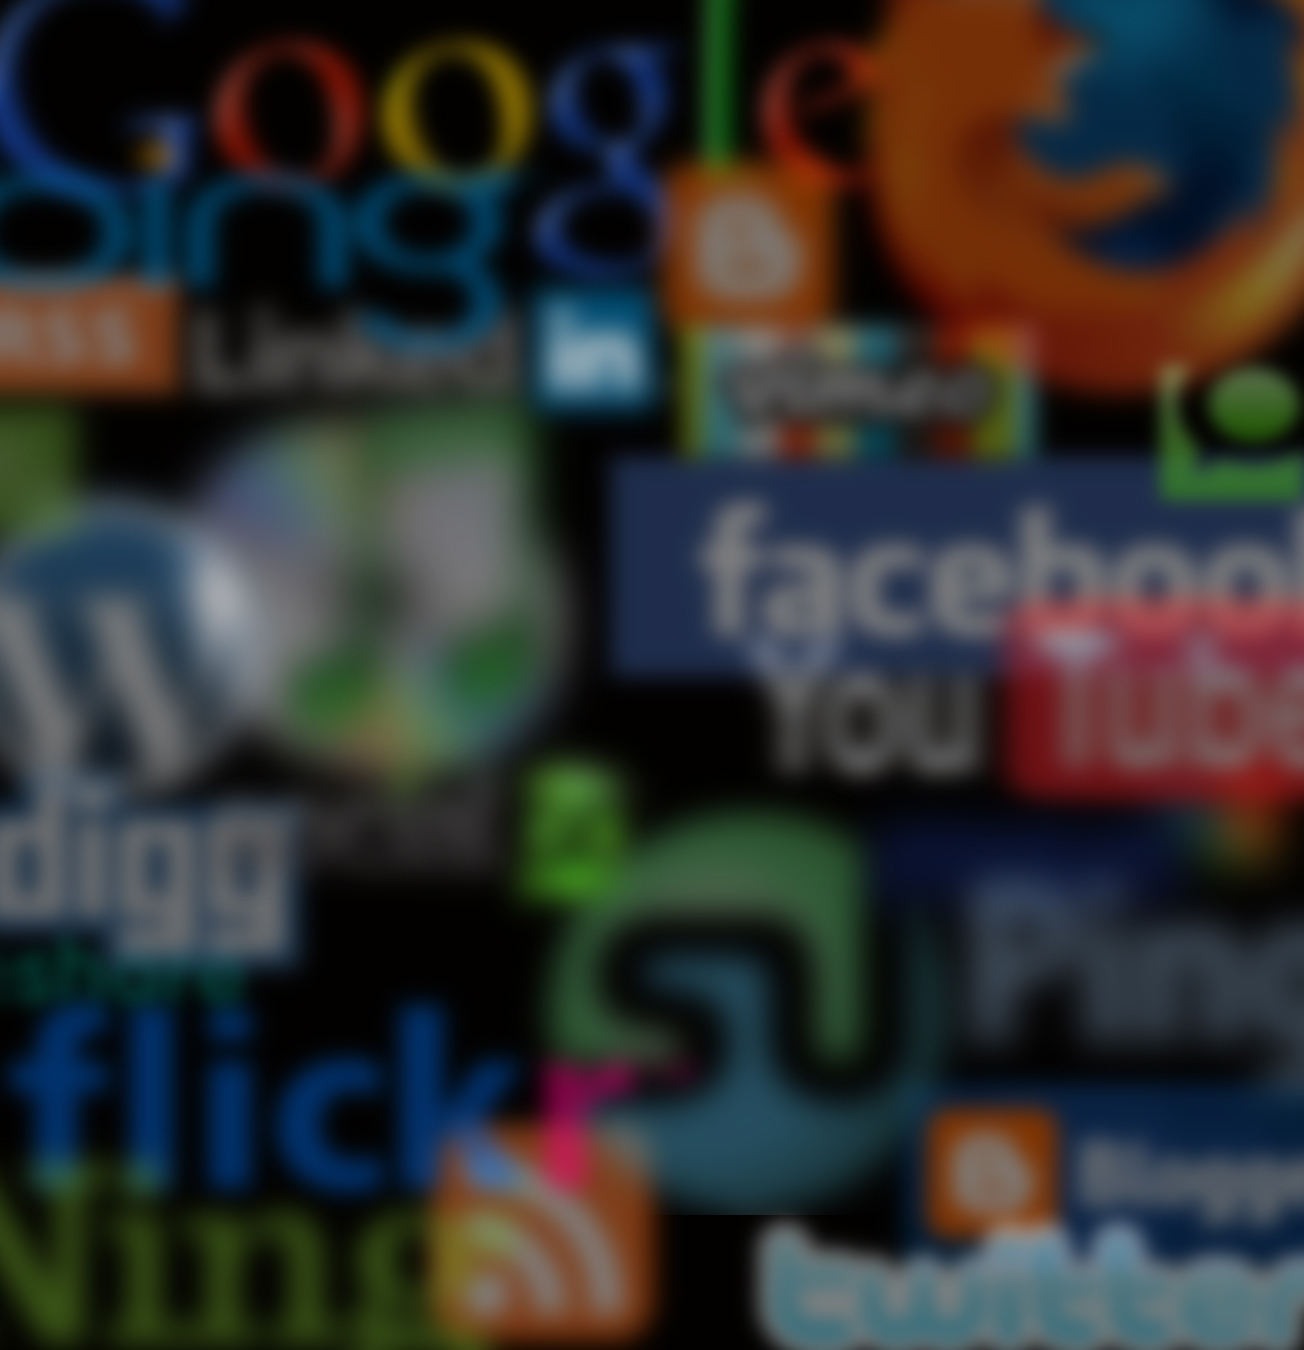 Podcastmatters Social Media Wallpaper for iPad 1304x1350